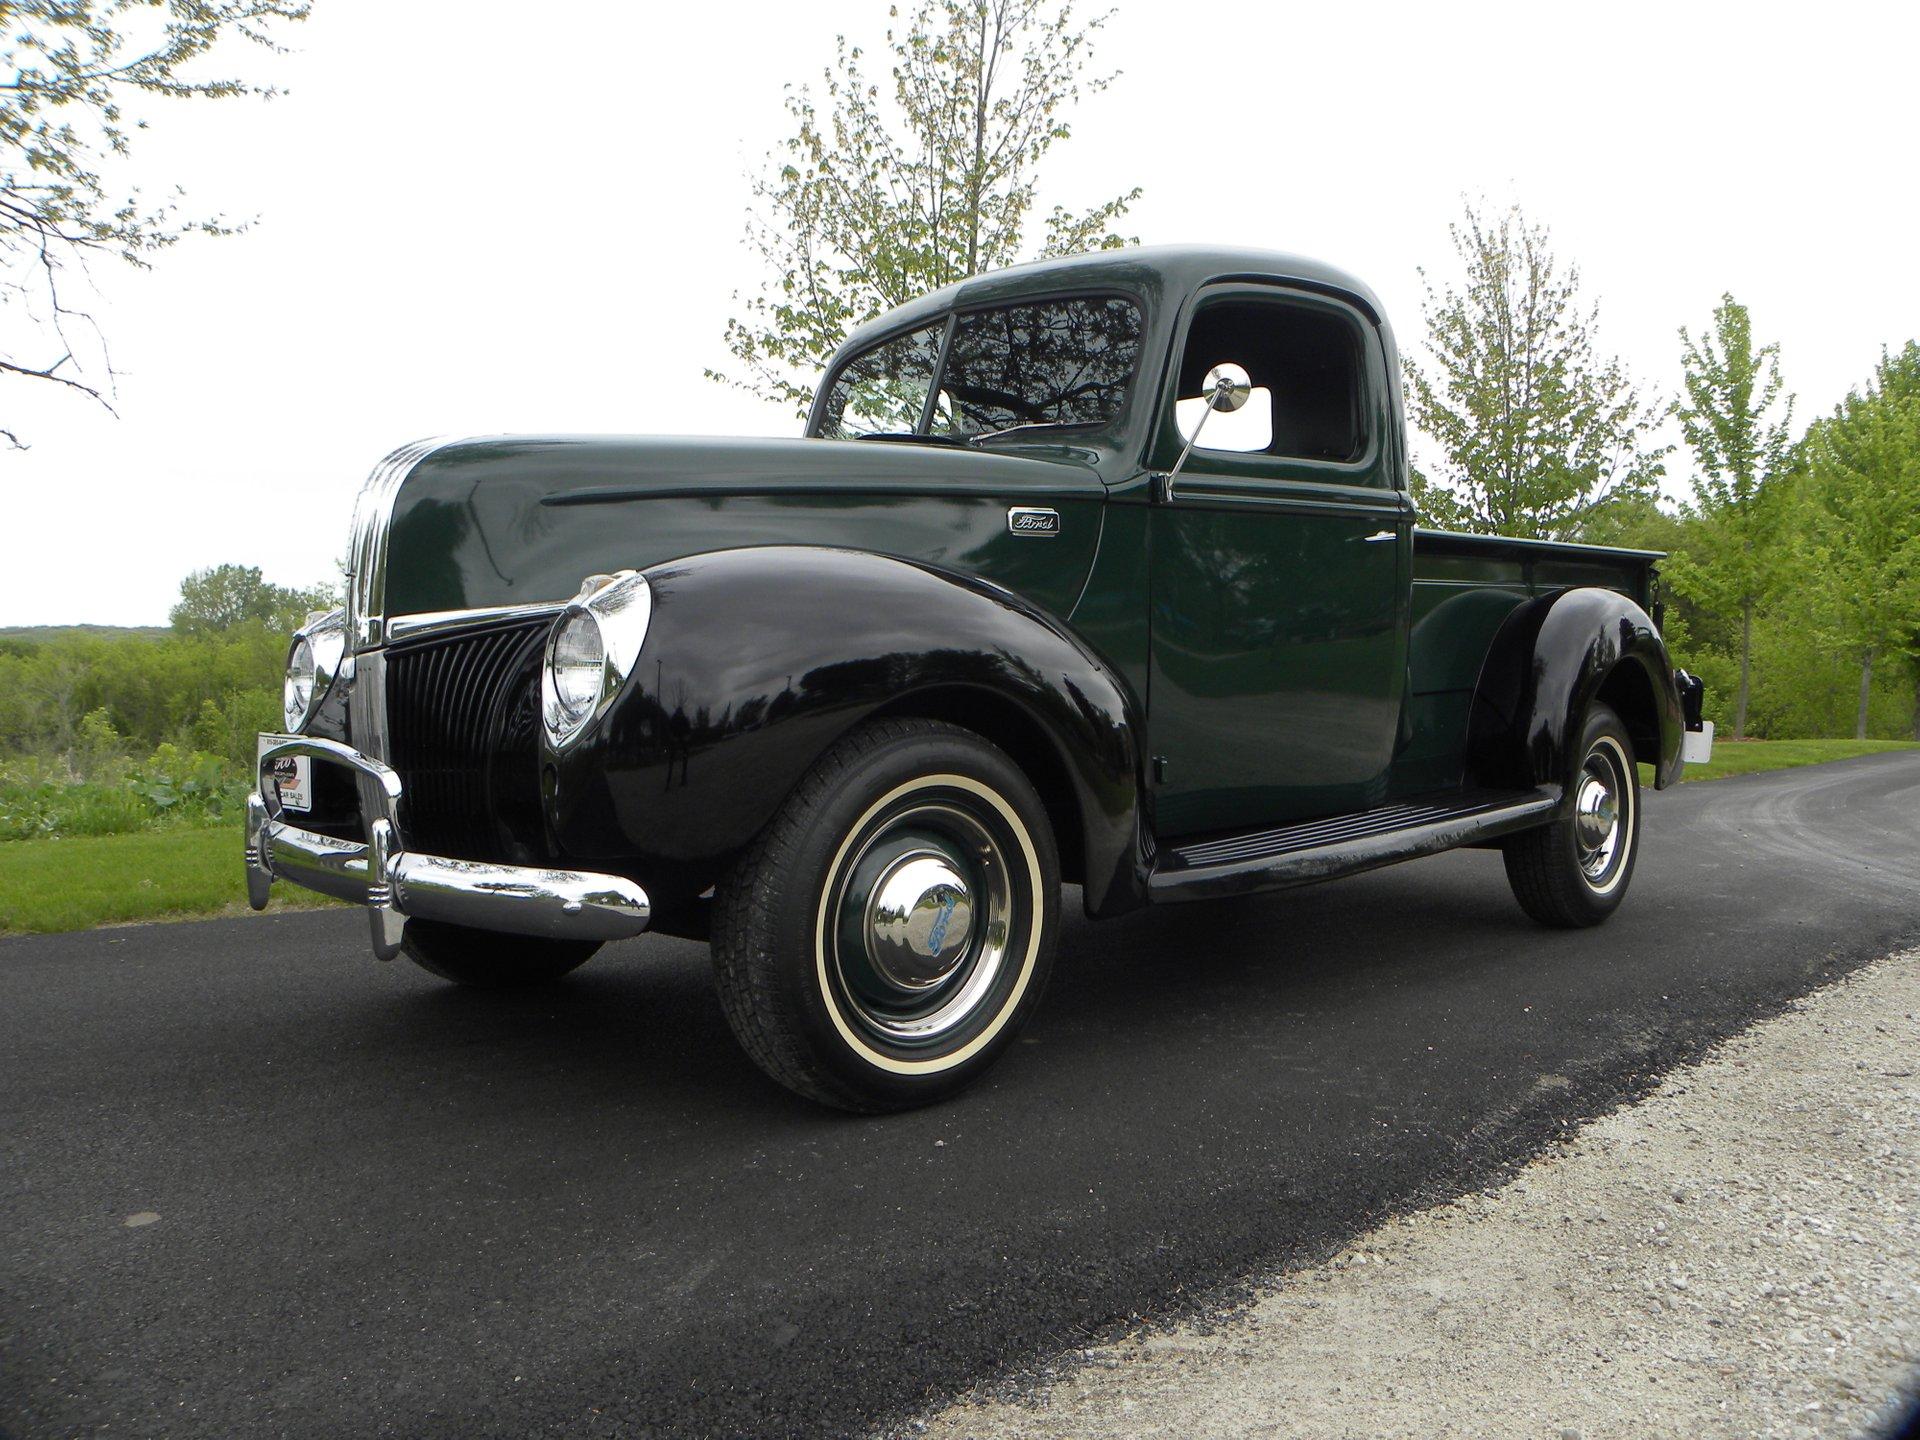 1941 Ford Volo Auto Museum Pickup Truck 22